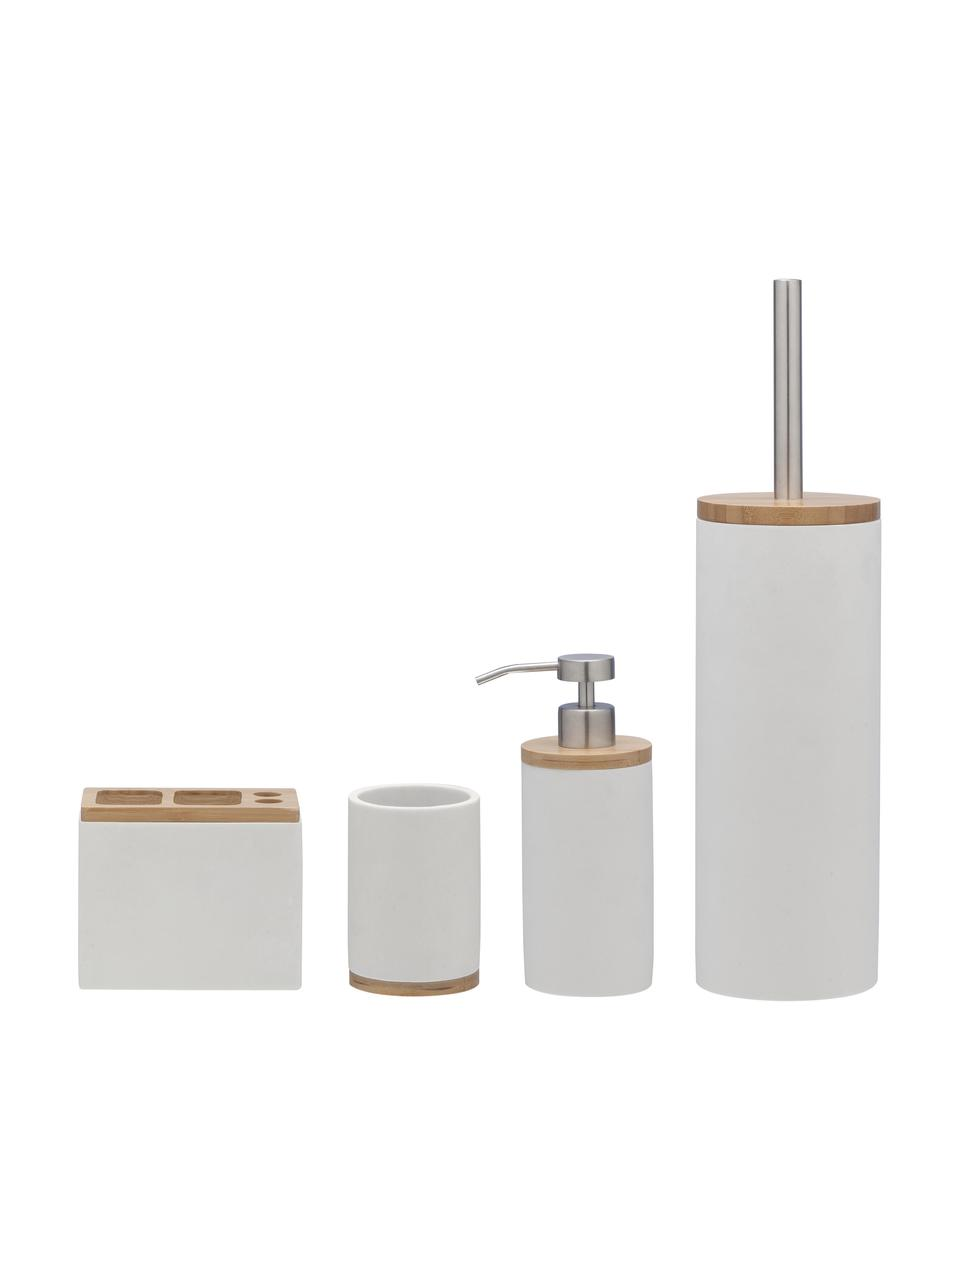 Zeepdispenser Grace met bamboehout, Houder: polyresin, Deksel: bamboehout, Pompje: kunststof, Wit, Ø 7 x H 18 cm